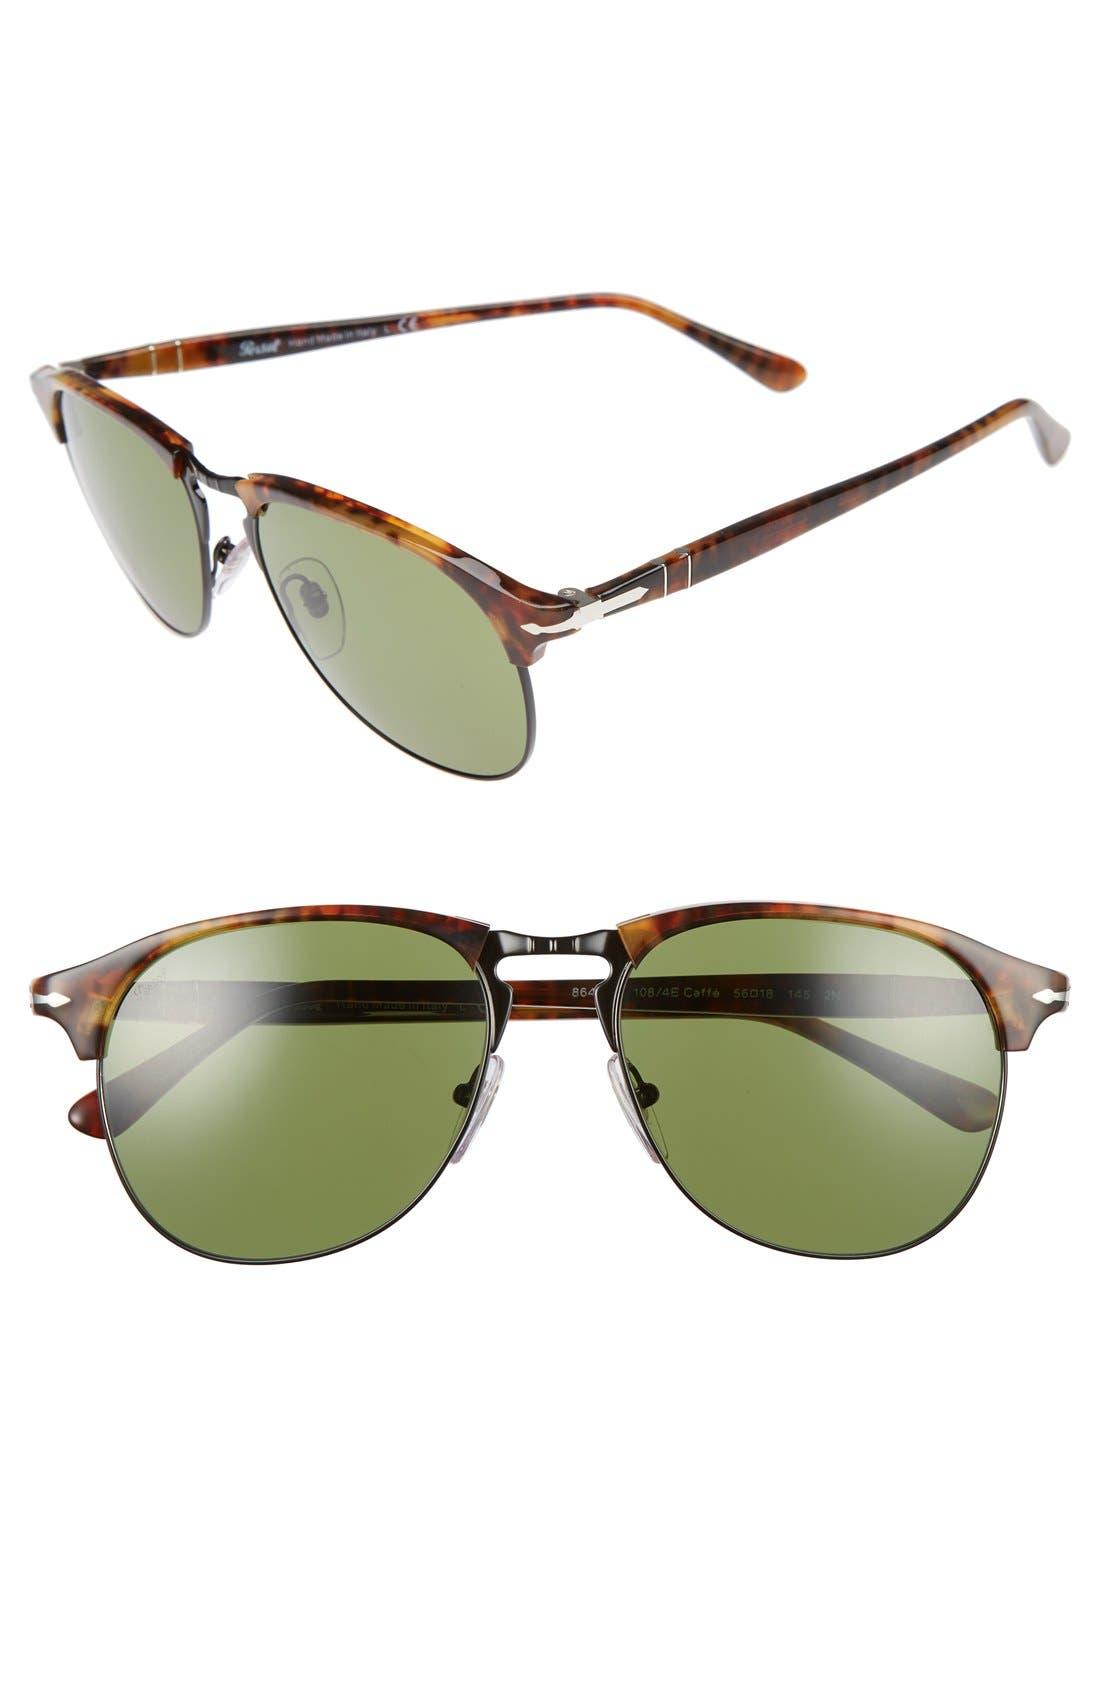 Main Image - Persol 56mm Keyhole Sunglasses